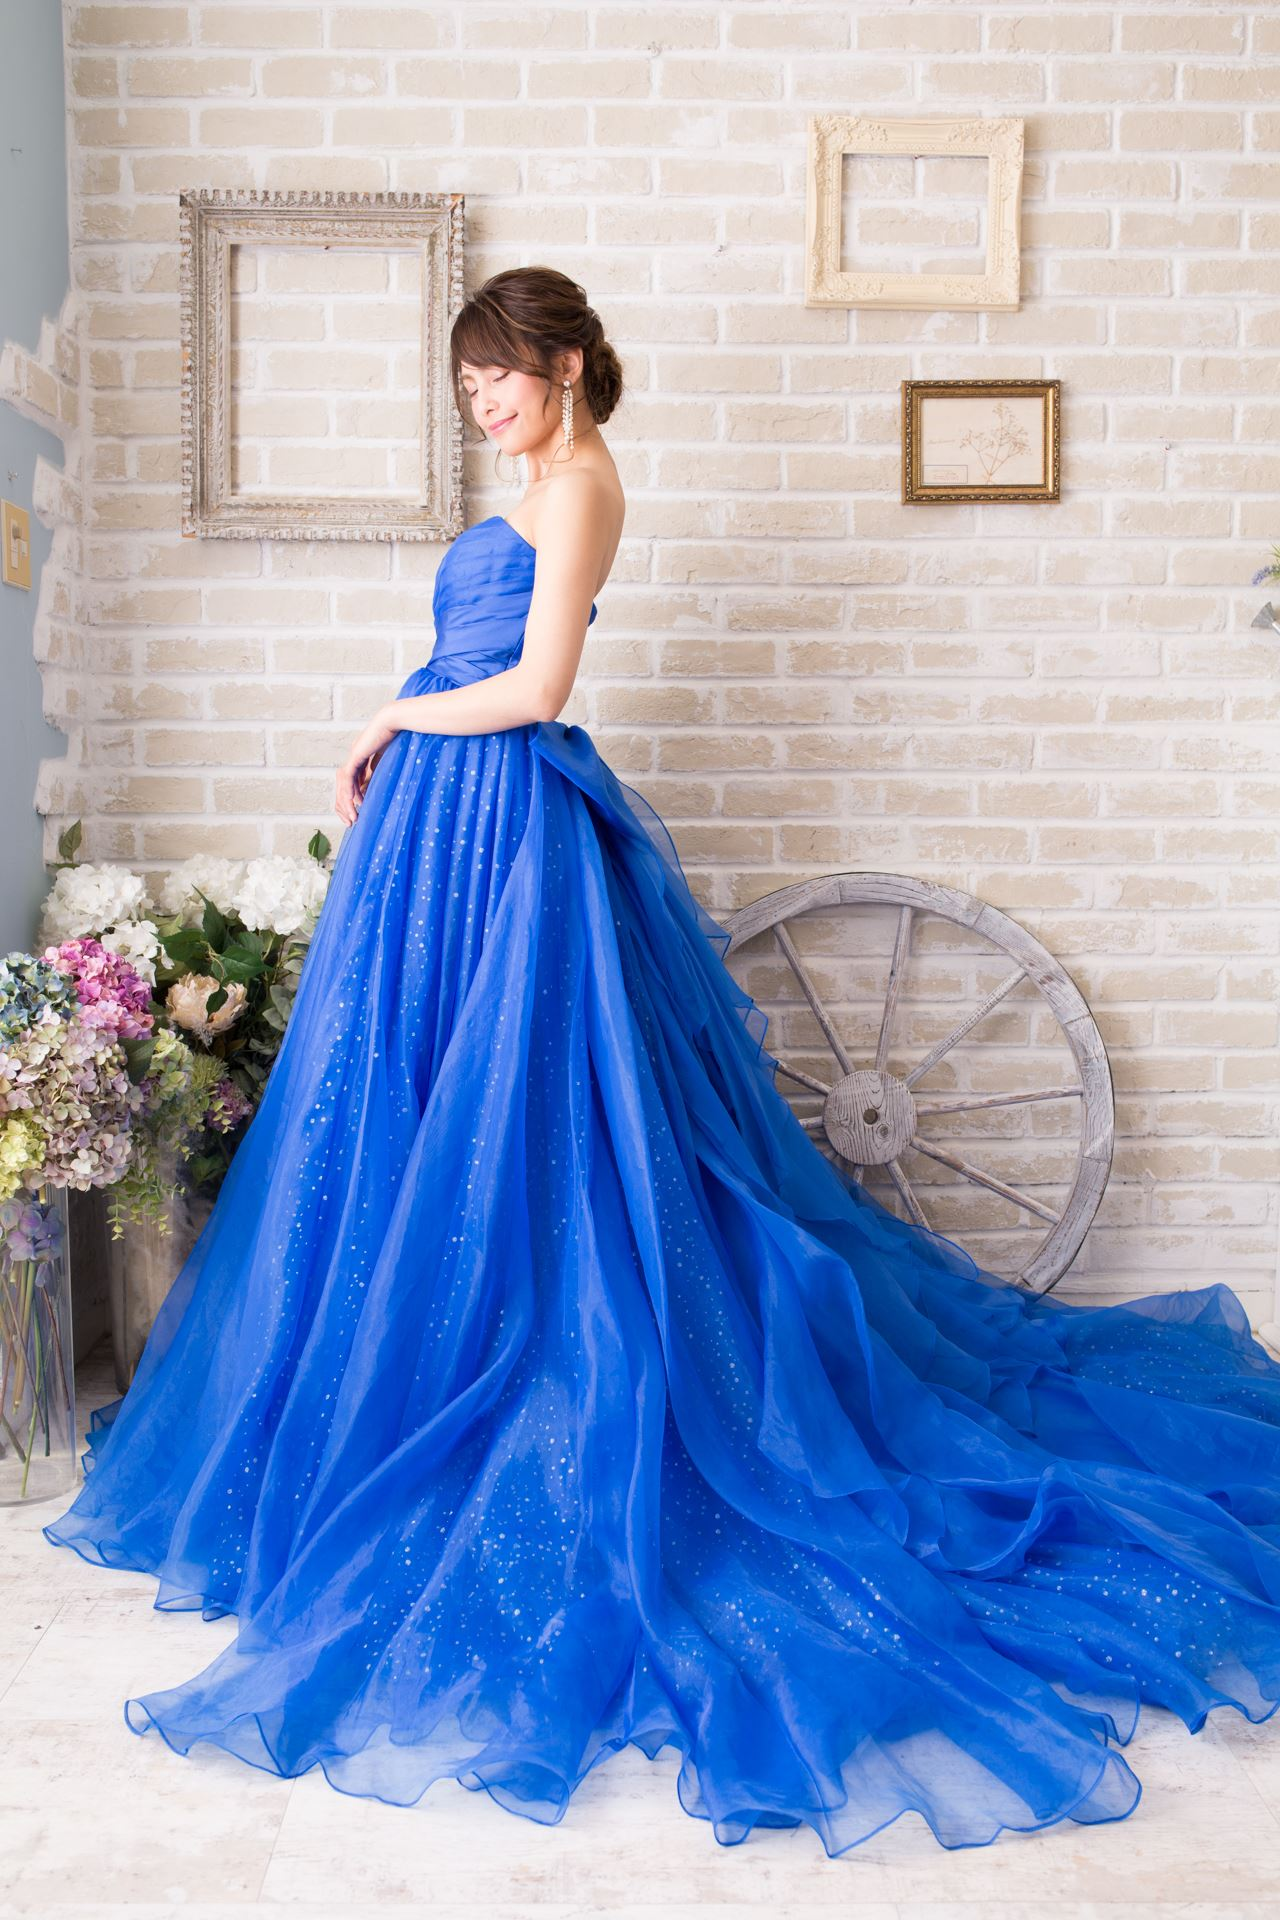 yk_nr_dress_416